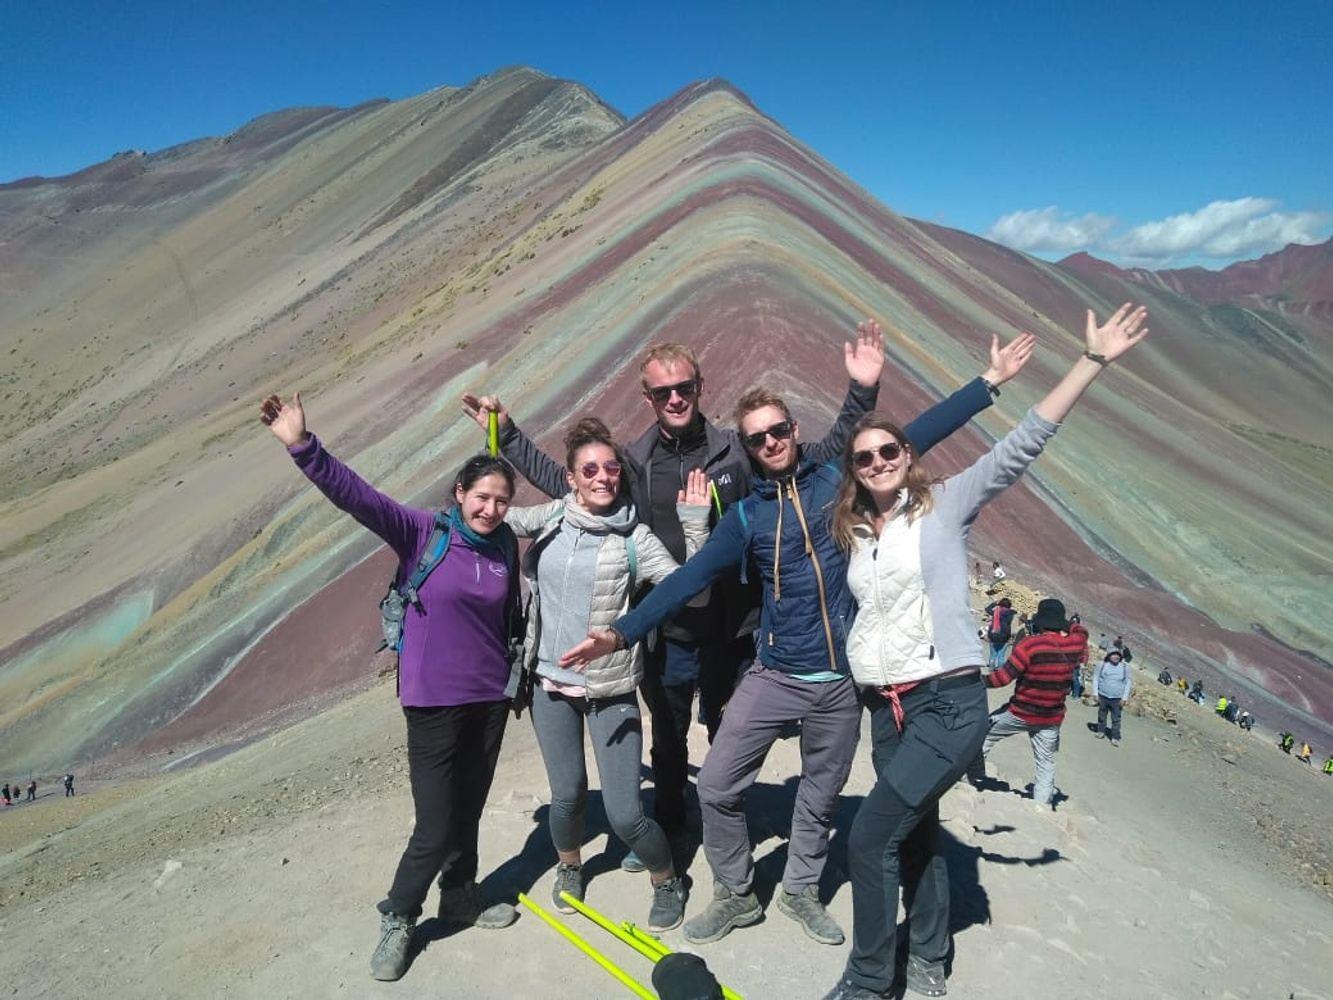 hike through the Rainbown mountain